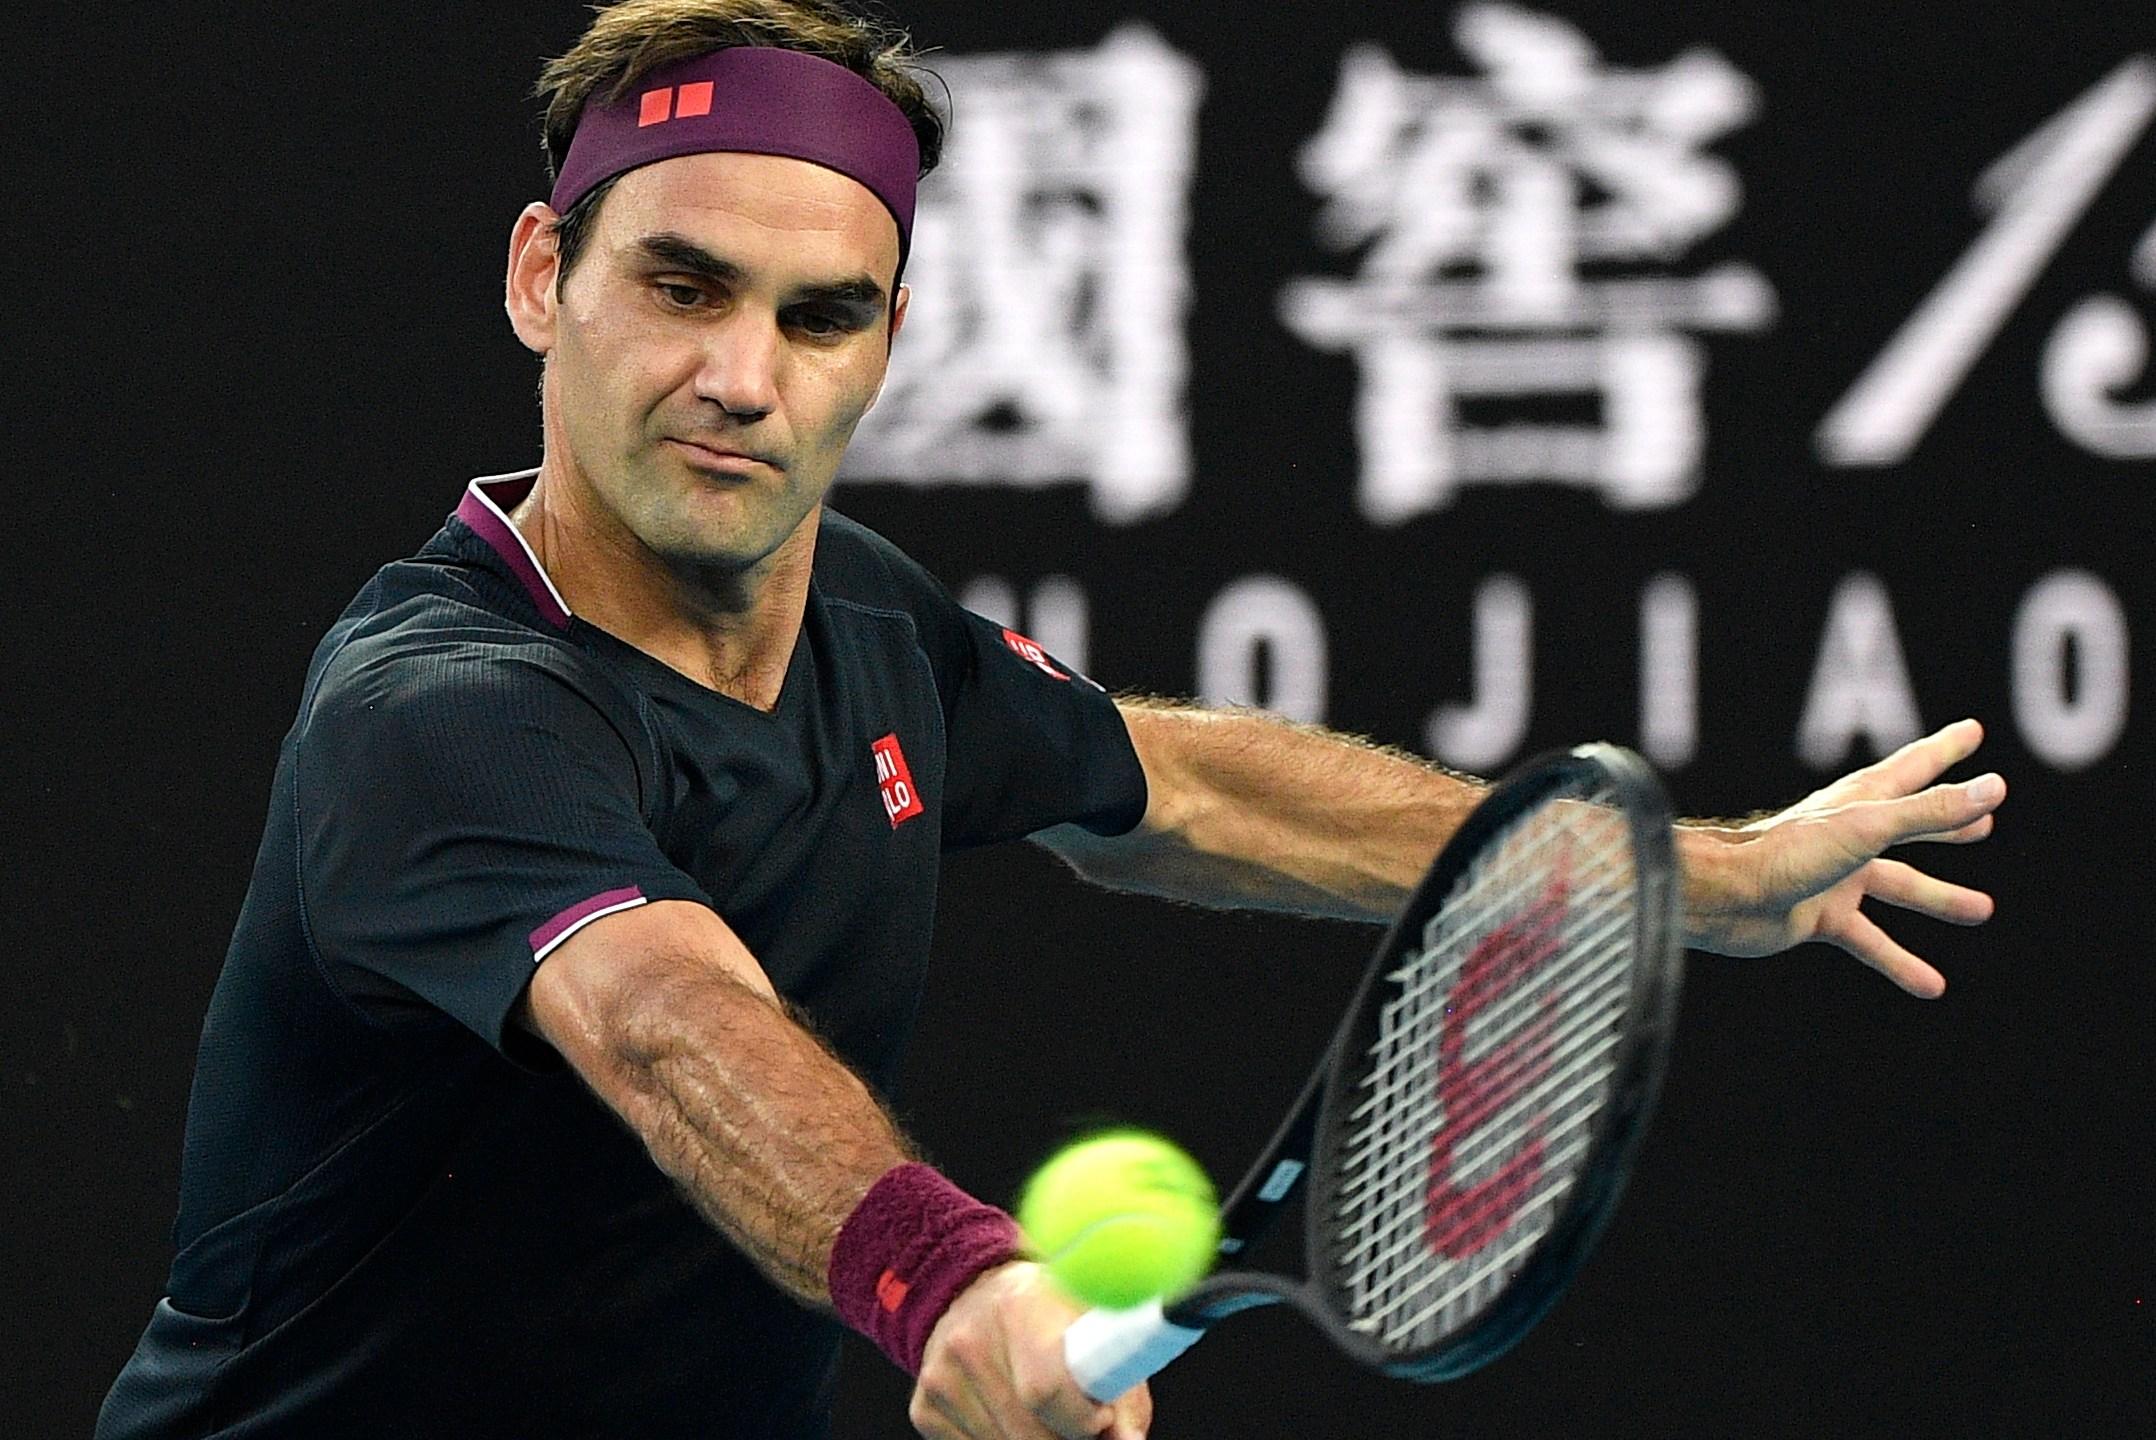 Federer Nadal Djokovic Let Fans Eavesdrop On Their Convos Krqe News 13